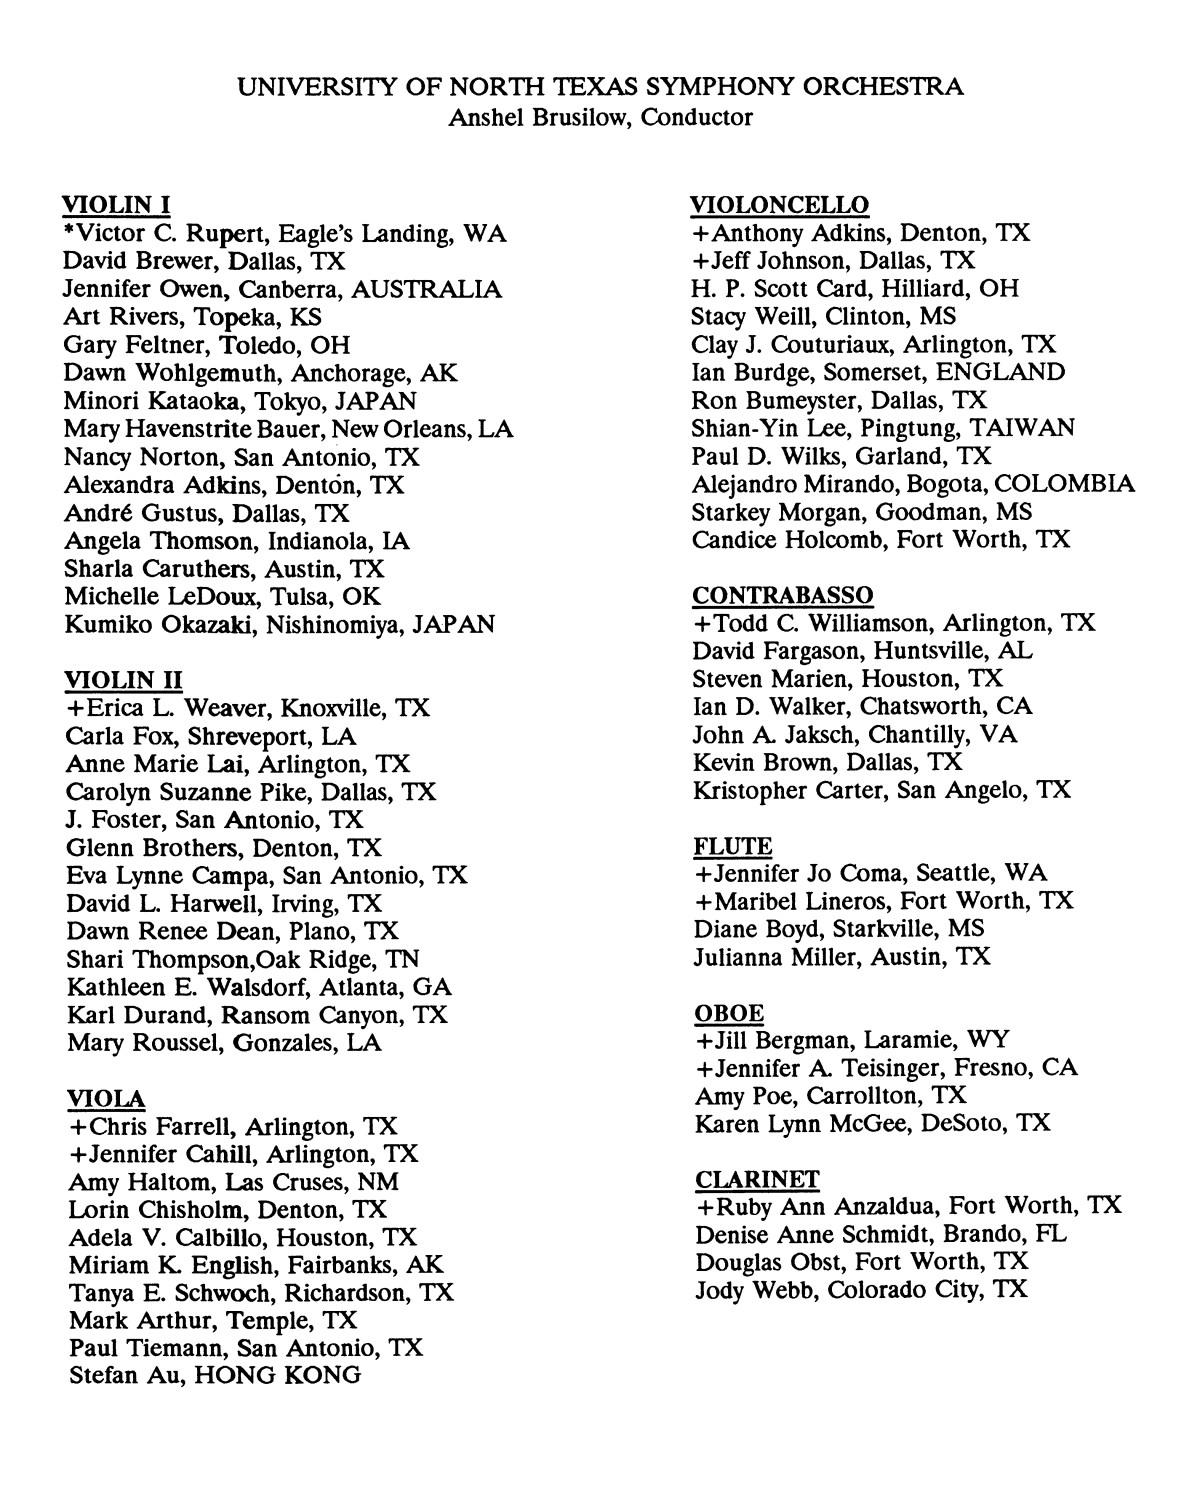 college of music program book 1991 1992 fall spring performances vol